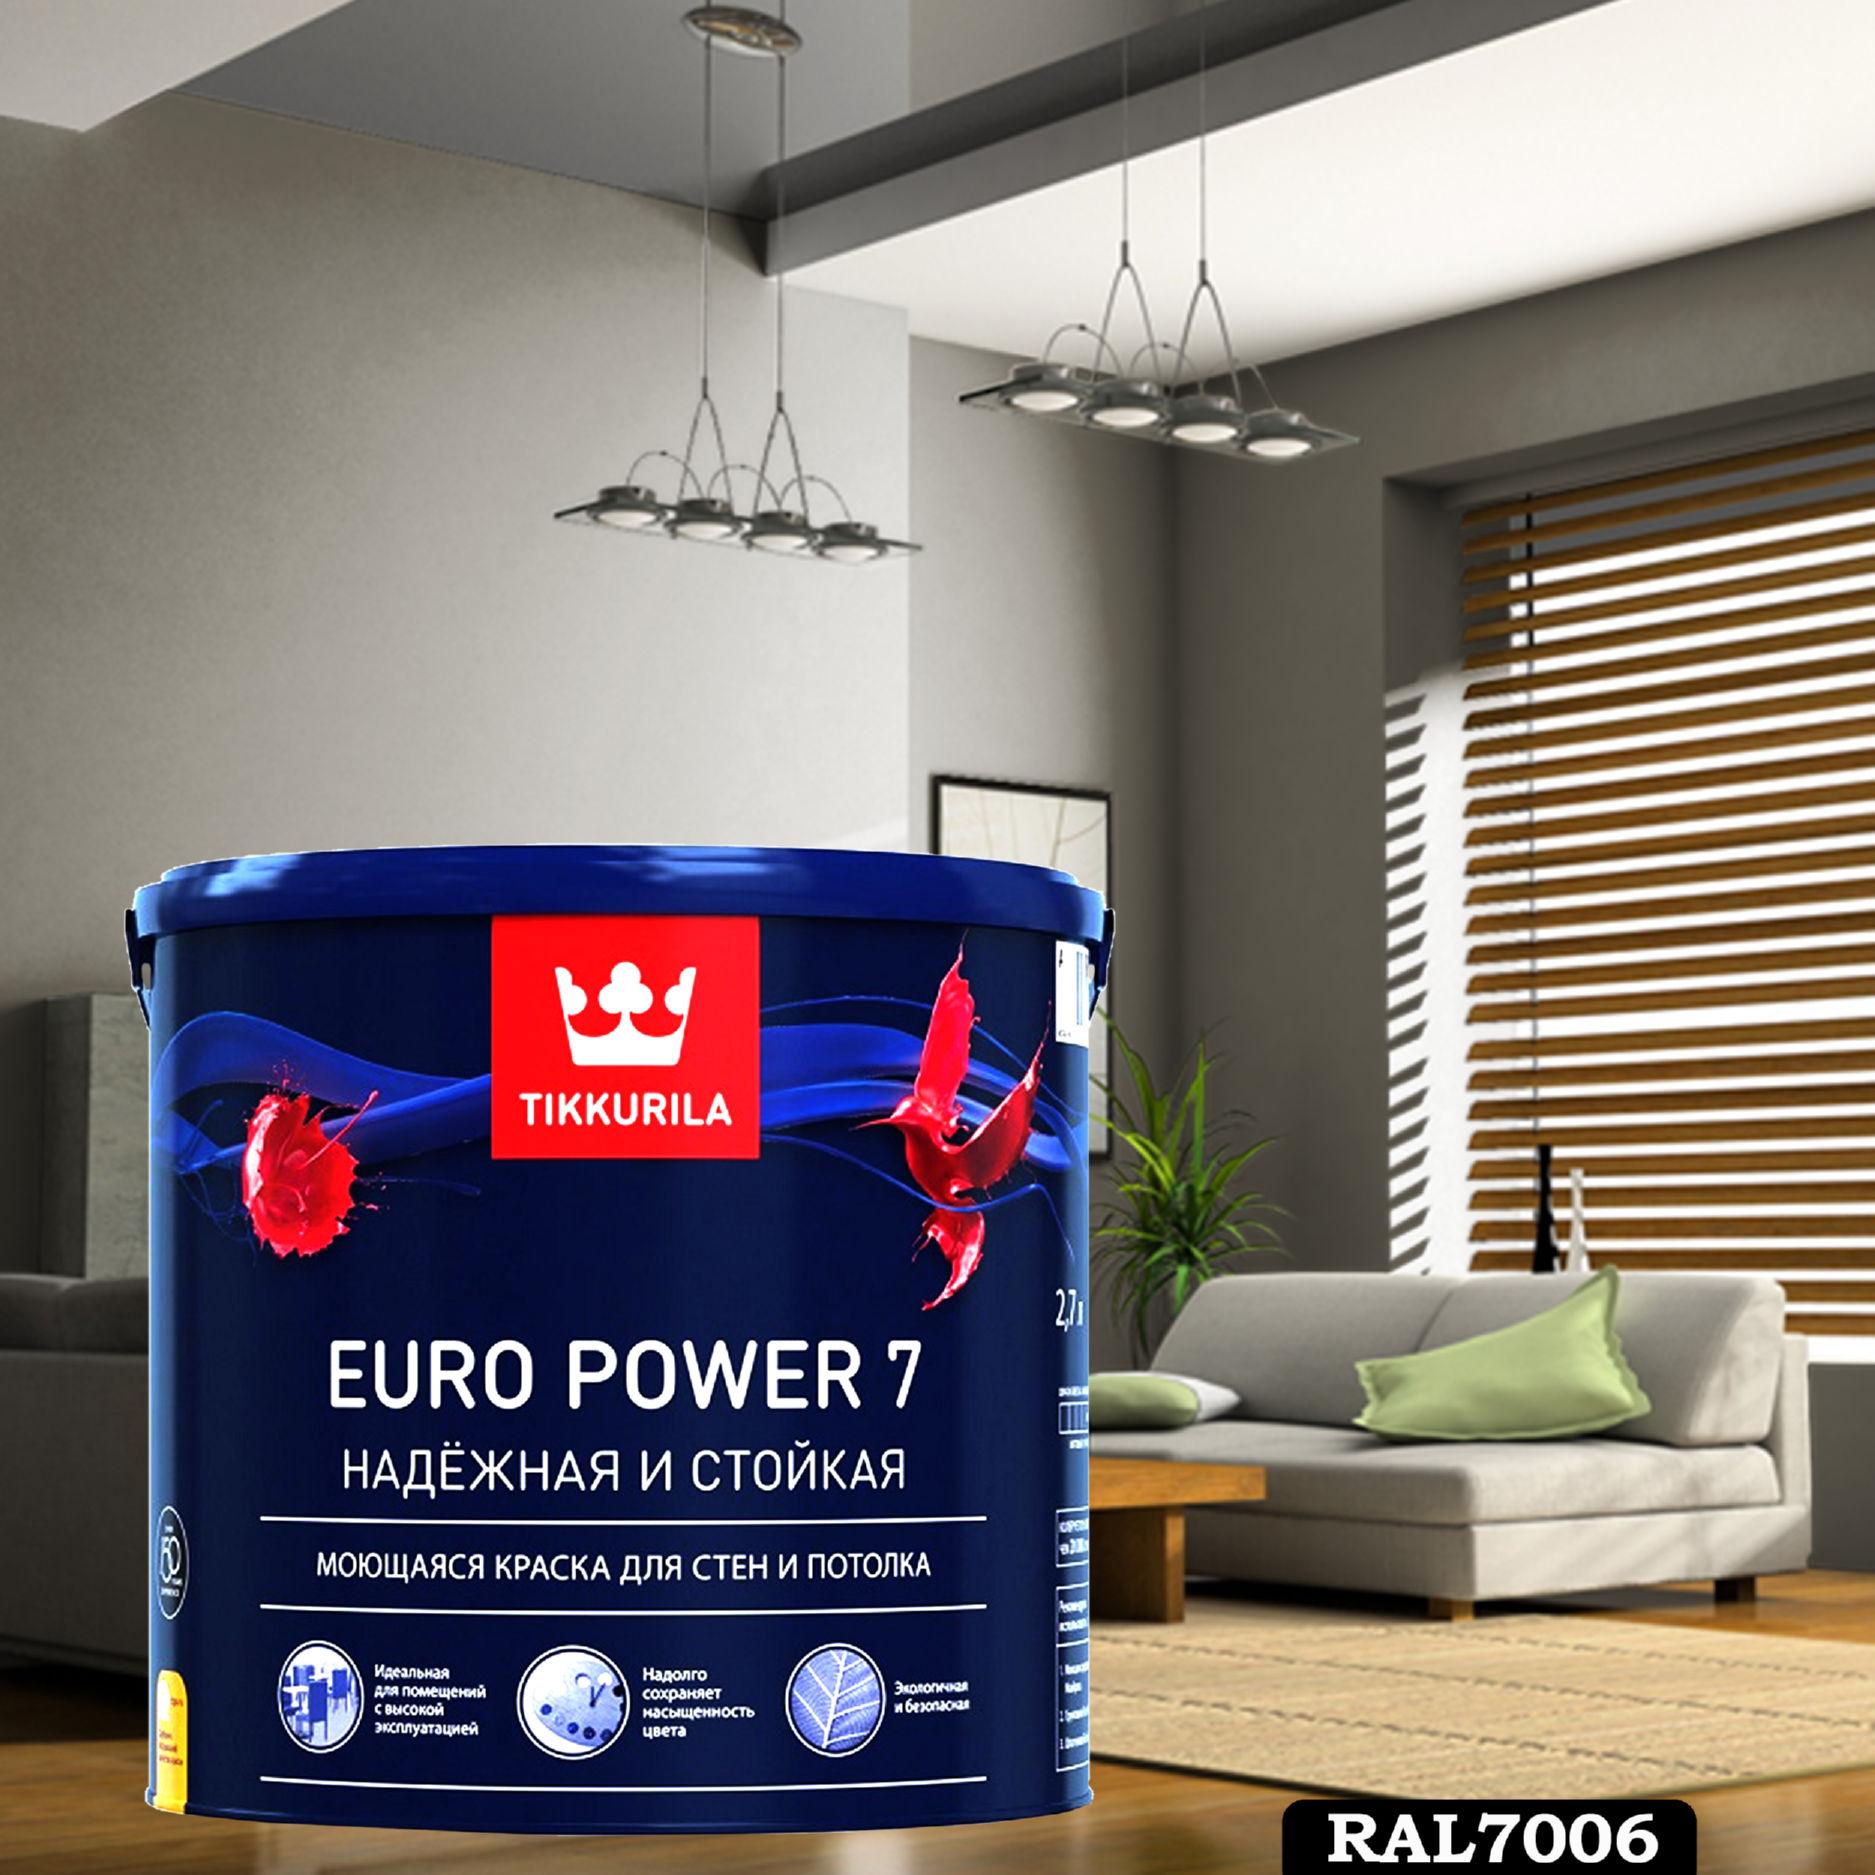 Фото 7 - Краска TIKKURILA Euro Power 7,  RAL 7006 Бежево-серый, латексная моющаяся матовая интерьерная, 9 л.